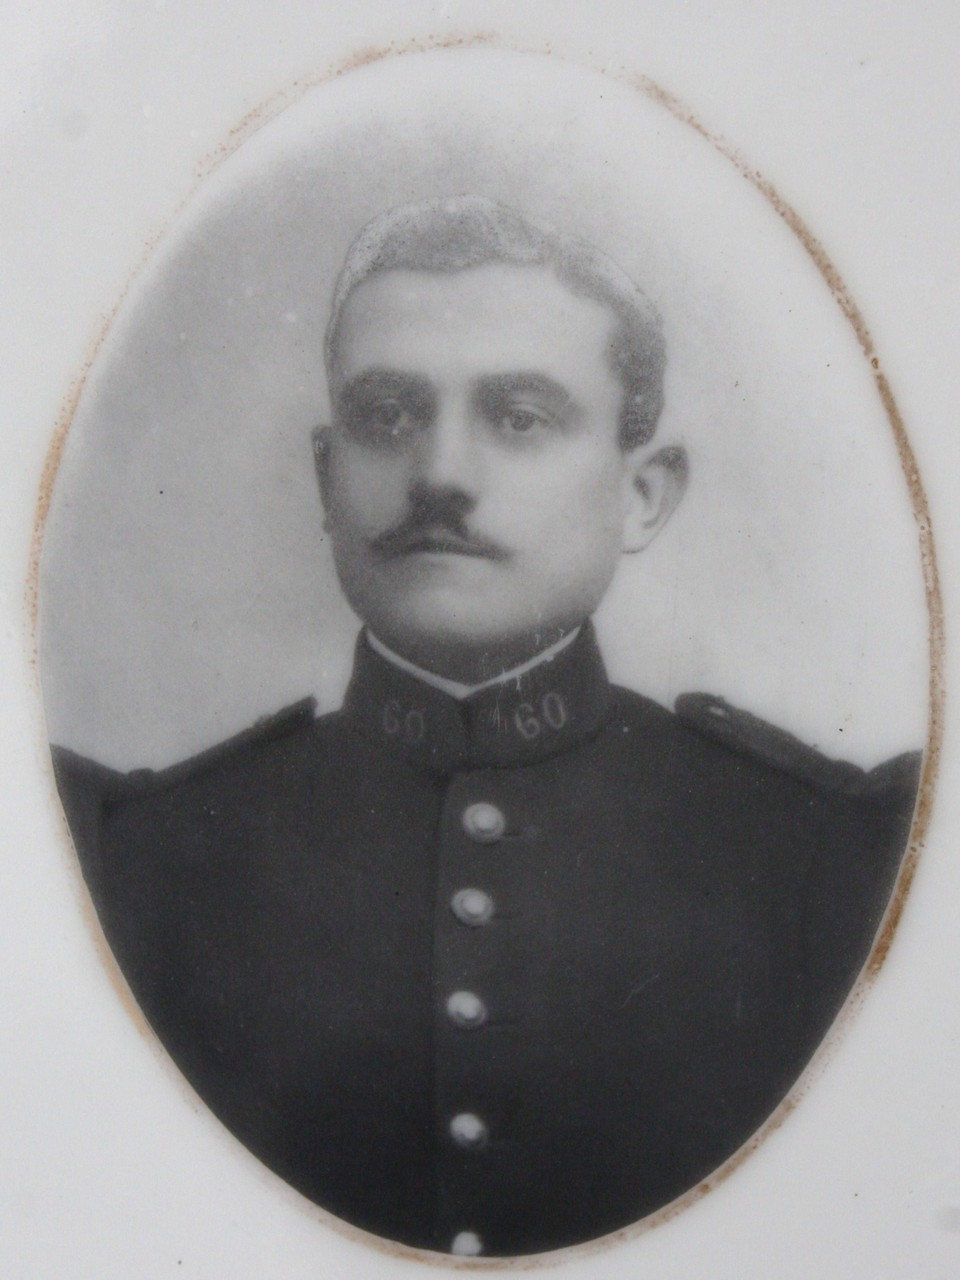 Charles GRENON MPLF le 16 juin 1915